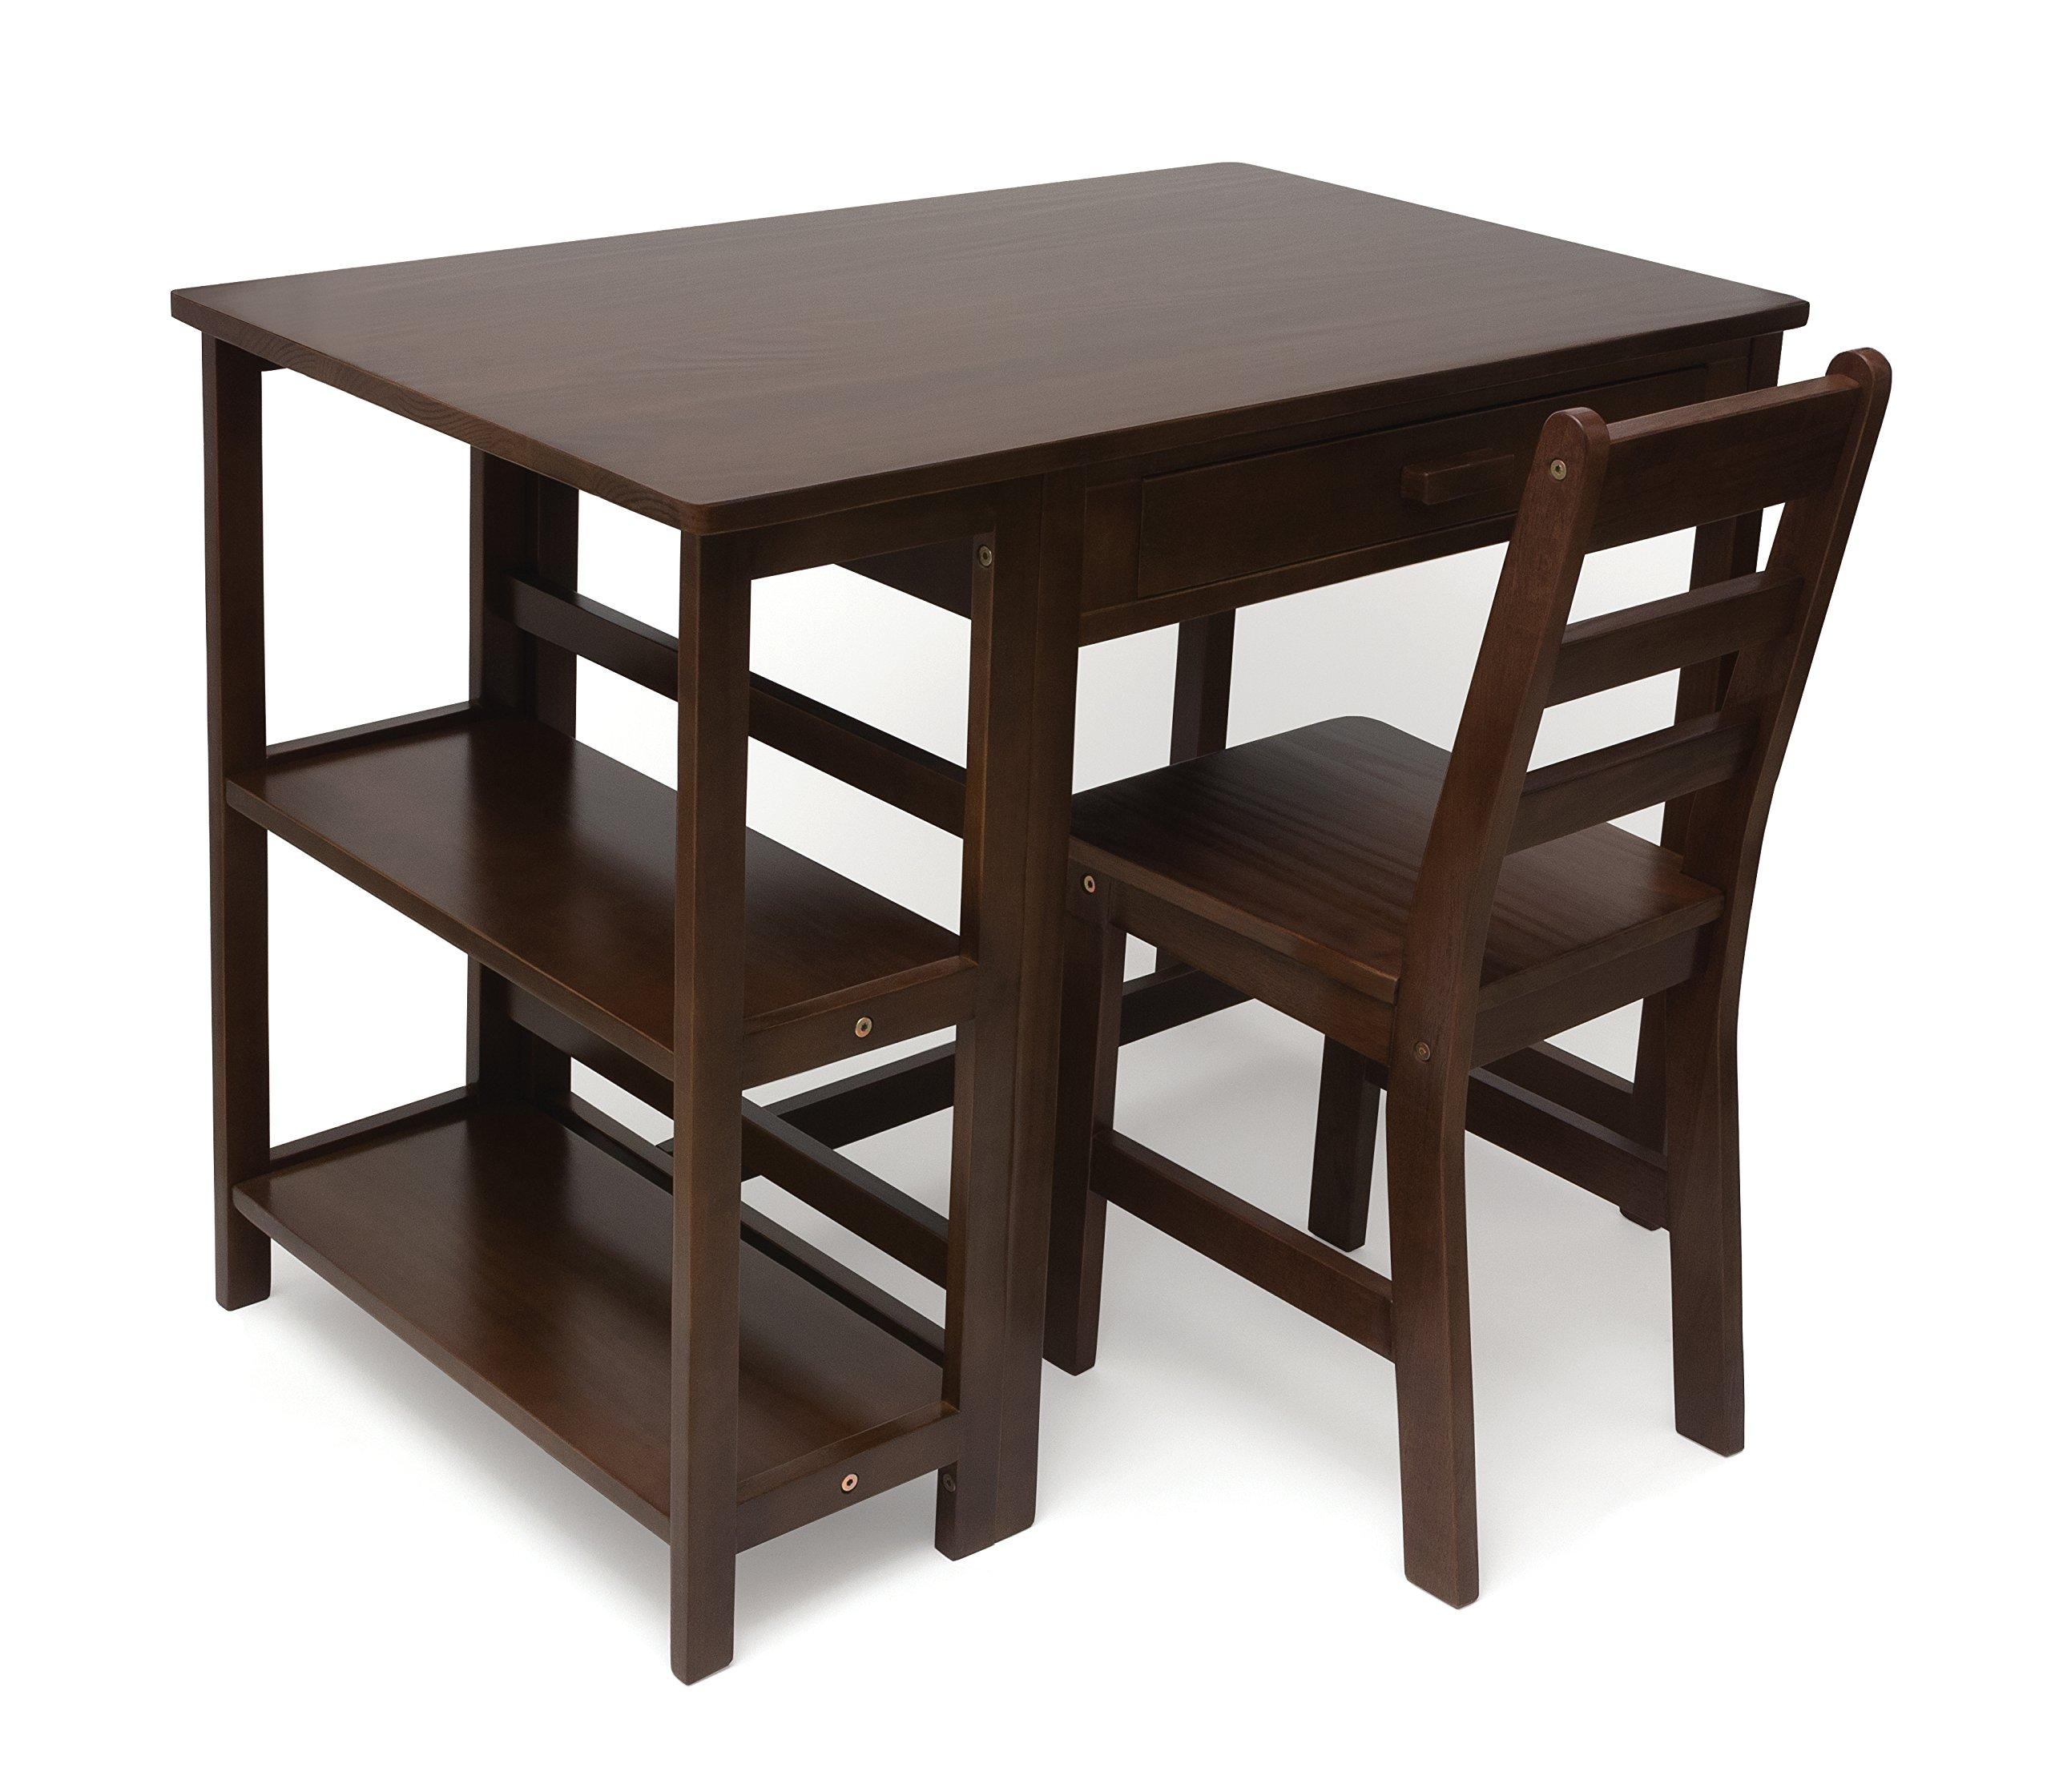 Lipper International 584WN Child's Work Station Desk and Chair, Walnut Finish by Lipper International